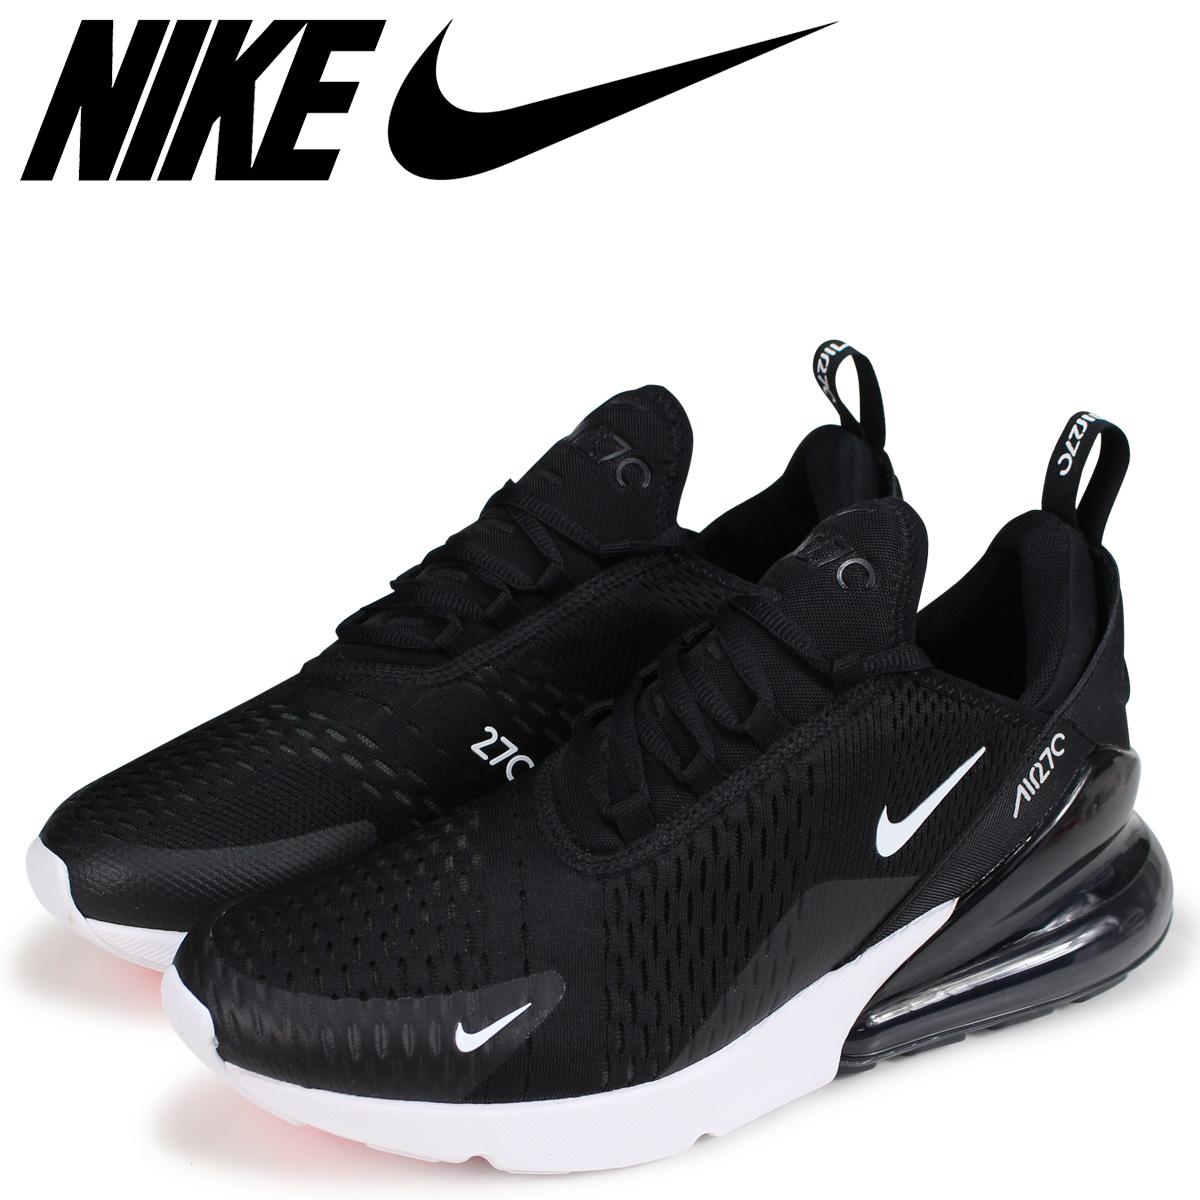 NIKE Kie Ney AMAX 270 sneakers men AIR MAX 270 AH8050 002 black black [the 816 additional arrival]